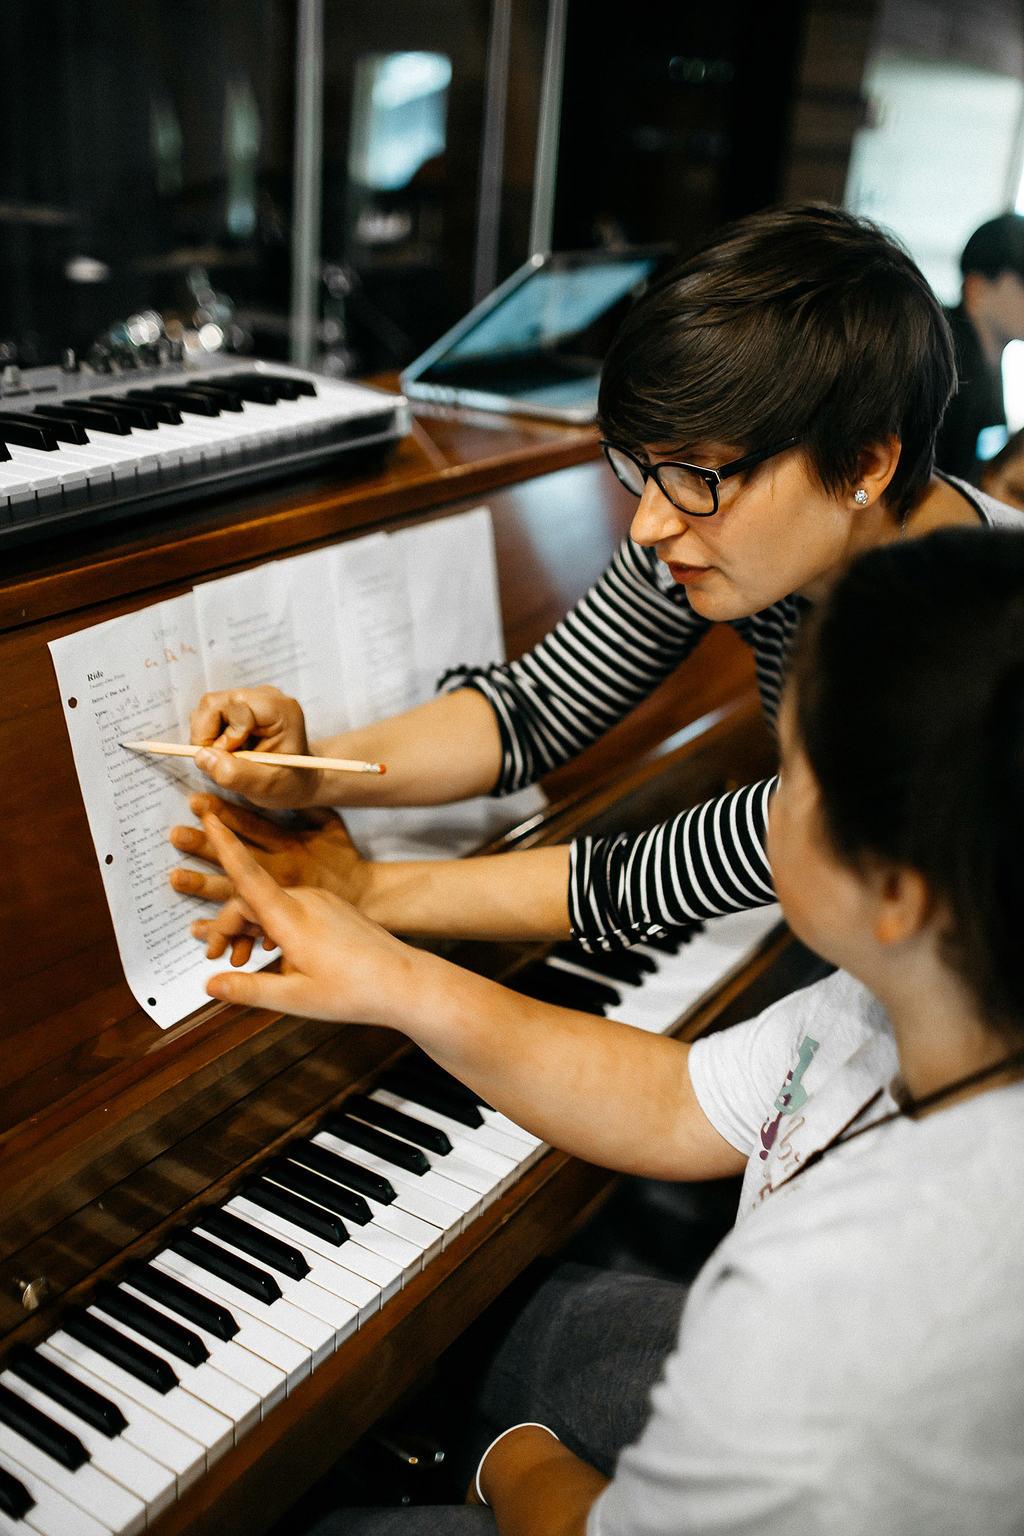 170628-musicfestival-practice_fb-105.jpg